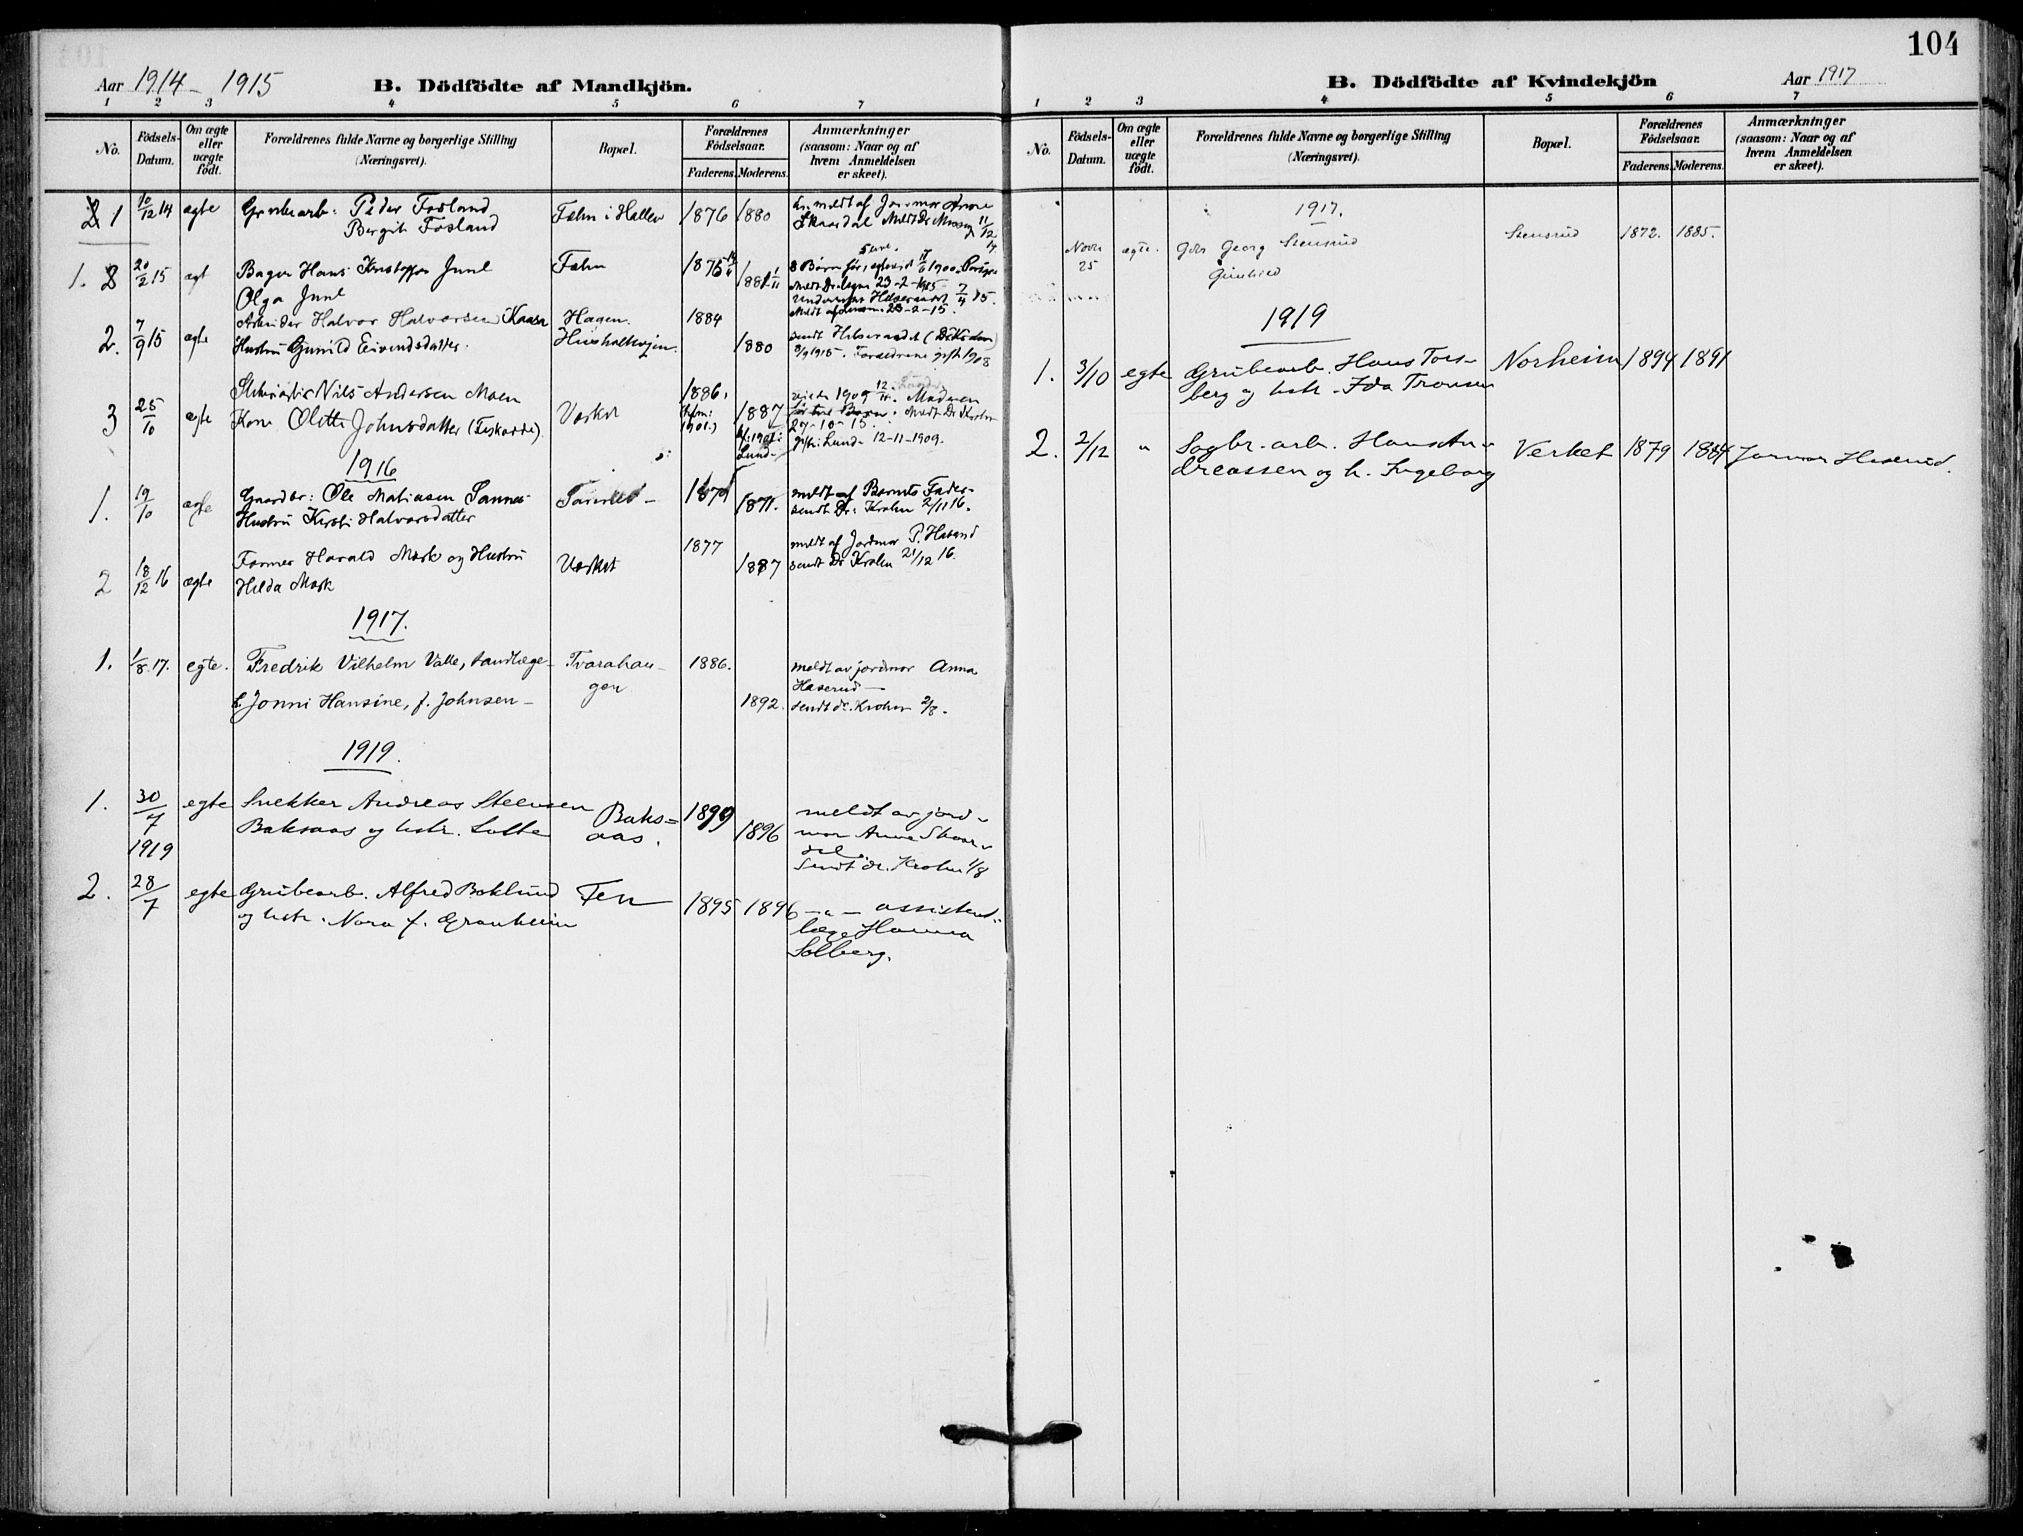 SAKO, Holla kirkebøker, F/Fa/L0012: Ministerialbok nr. 12, 1907-1923, s. 104